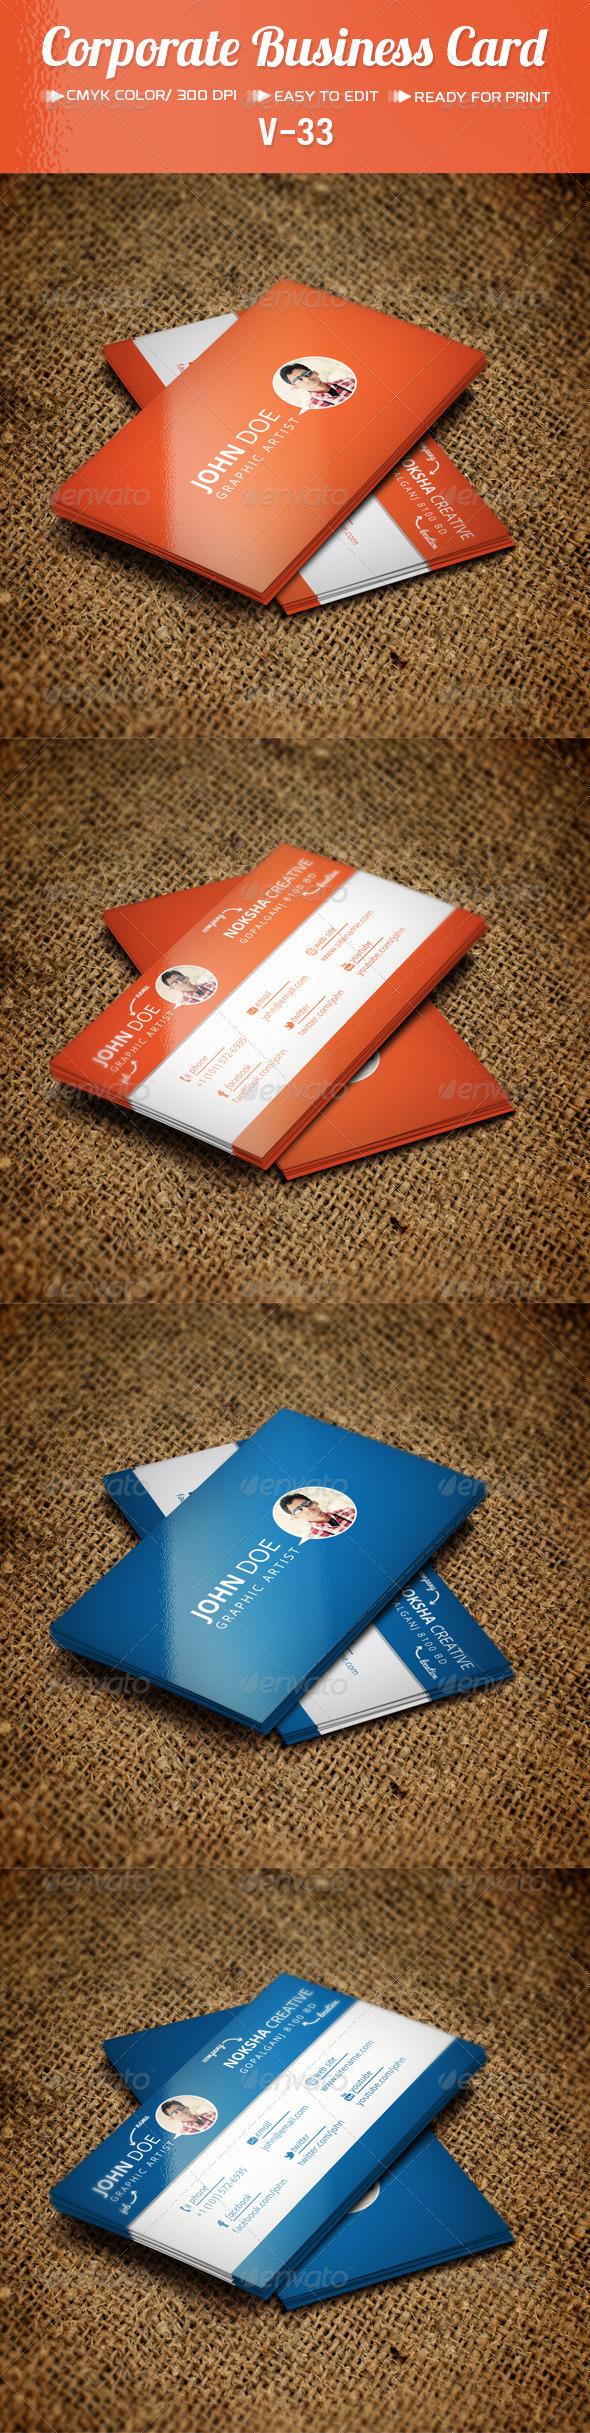 Corporate Business Card V-33 - Corporate Business Cards